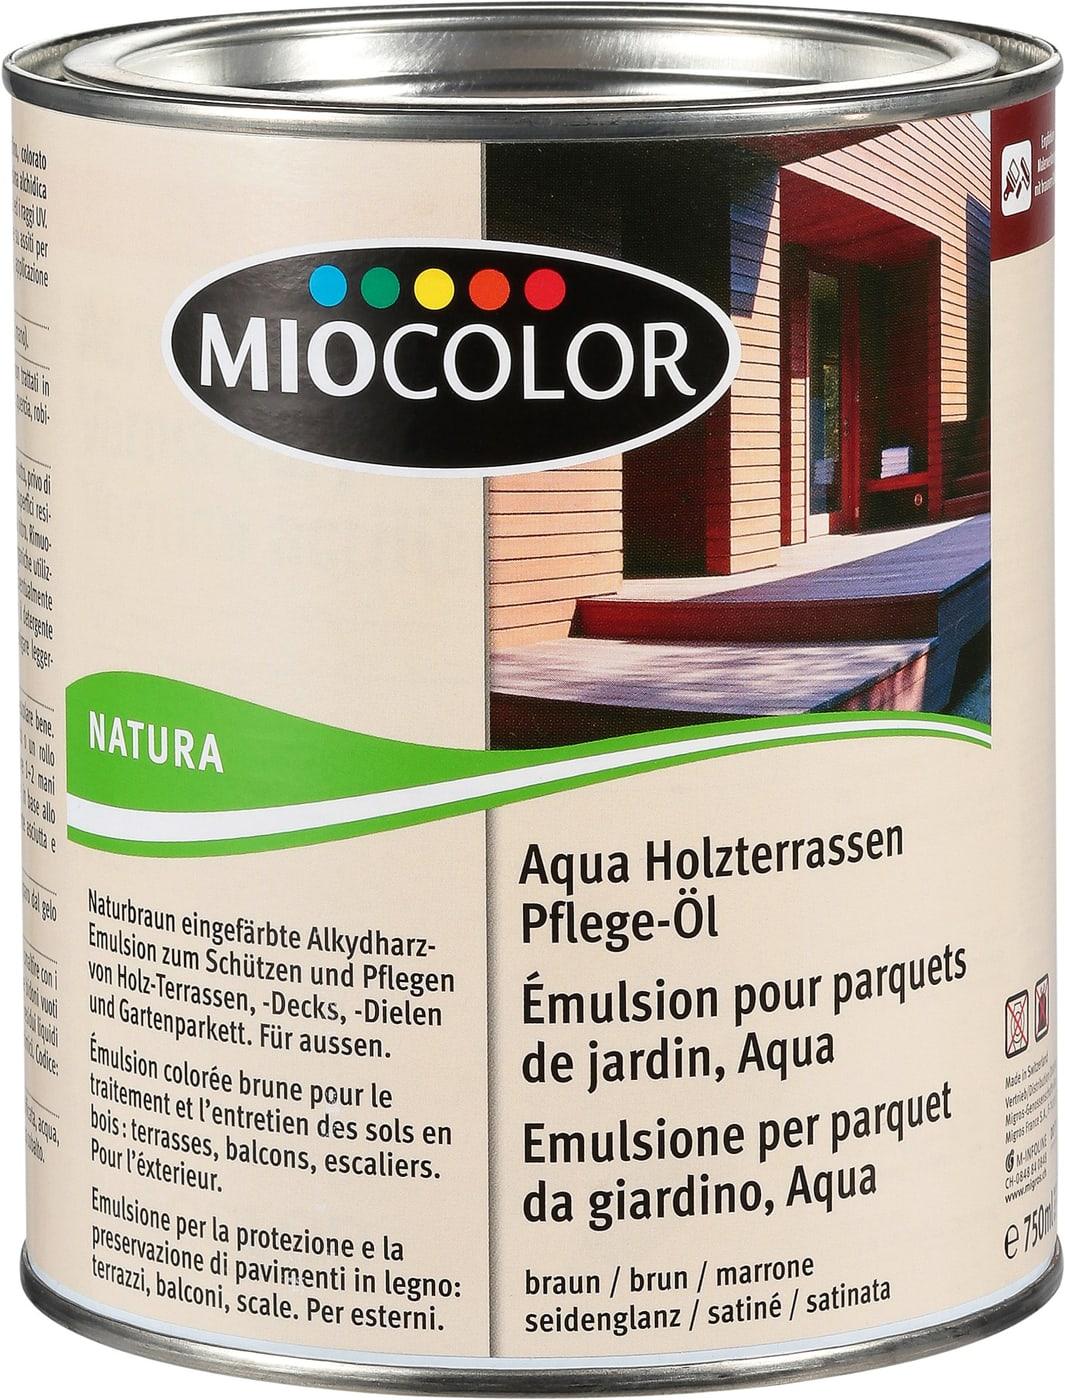 Miocolor Aqua Holzterrassen Pflege Ol Migros